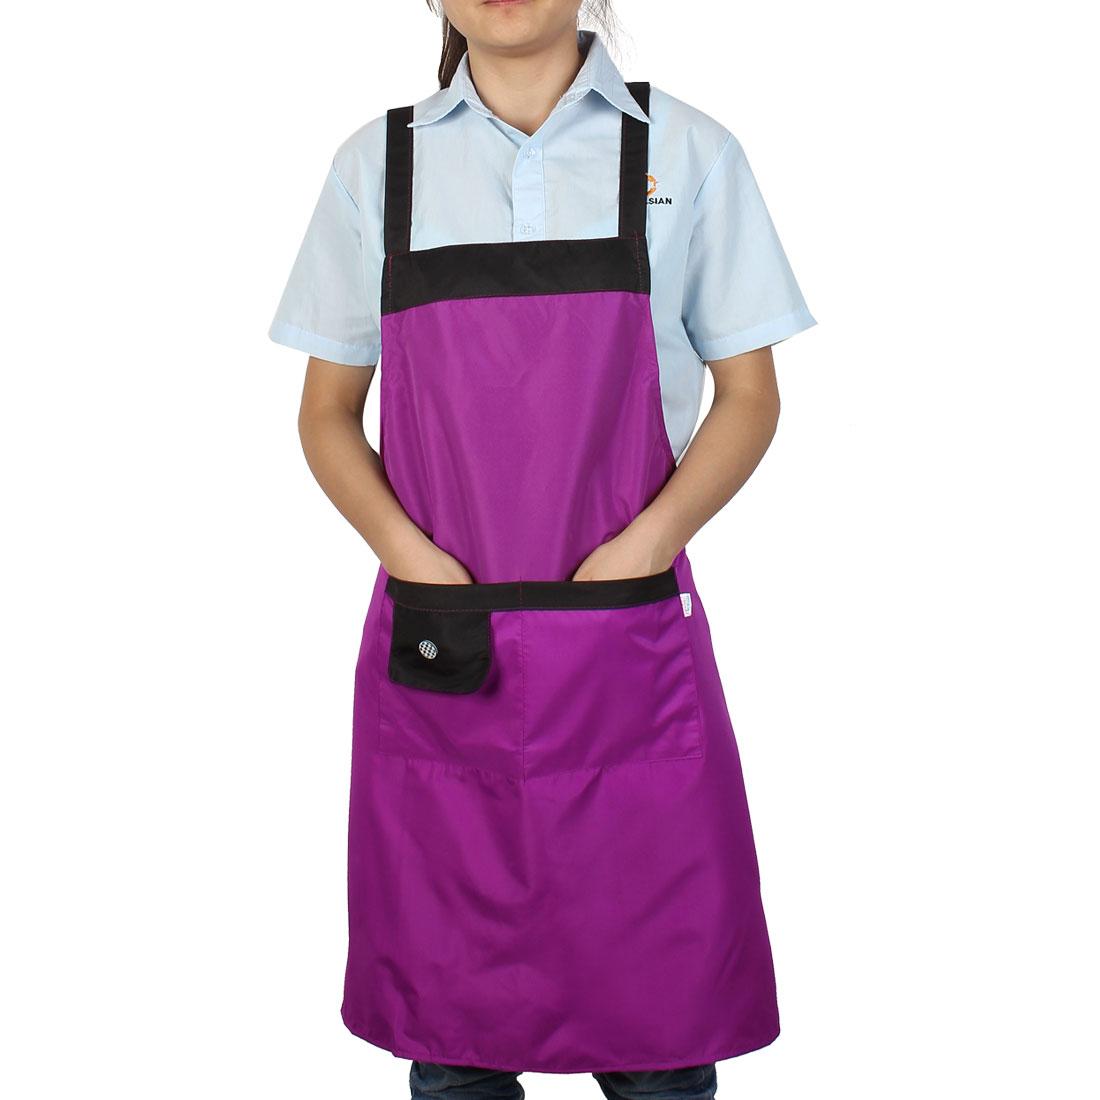 Kitchen Cook Cooking Self Tie Button Detail 2 Pocket Bib Apron Dress Brown